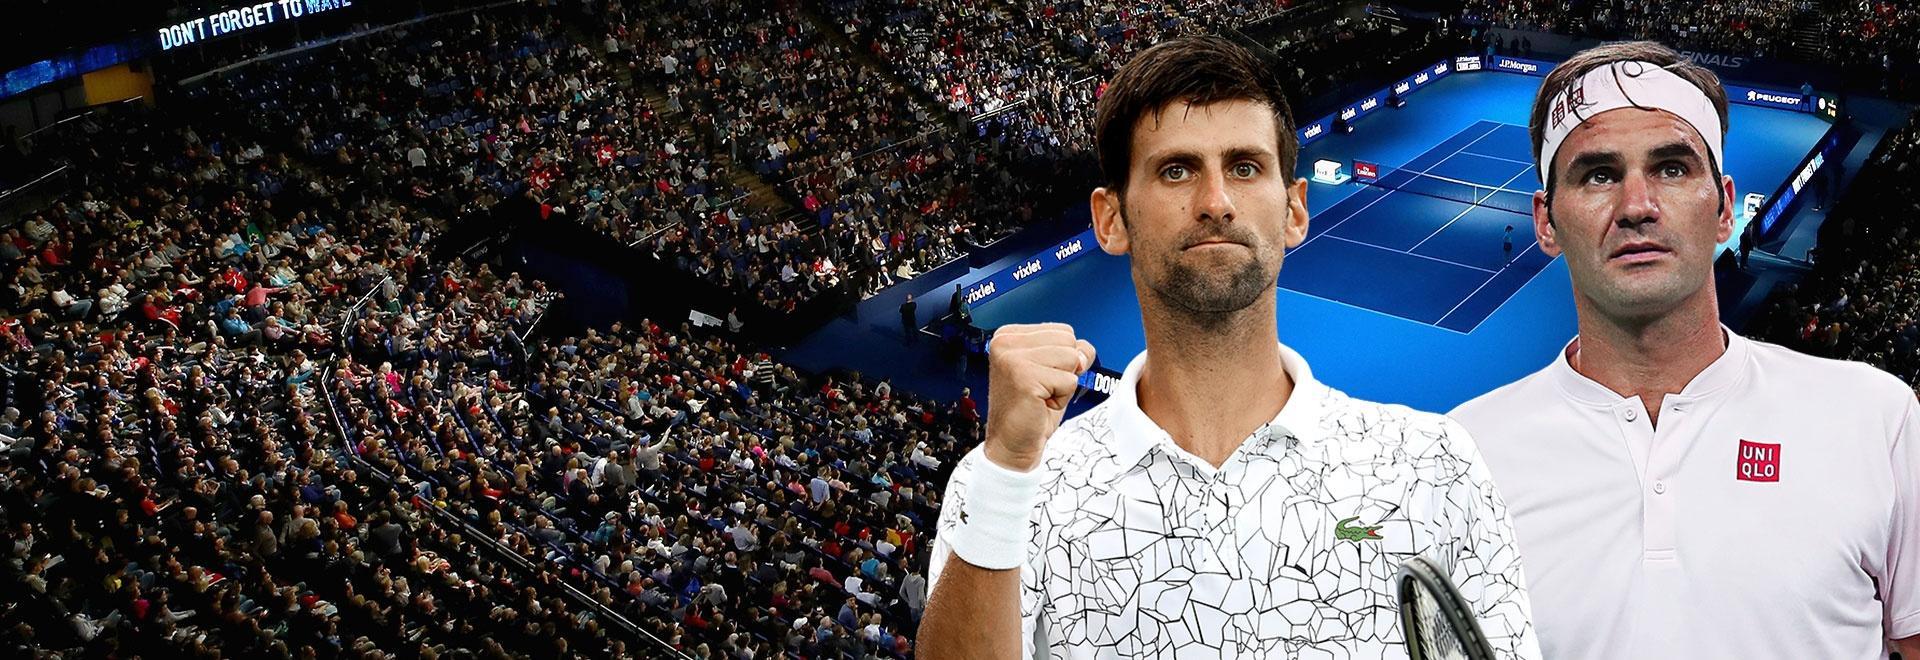 Djokovic - Federer